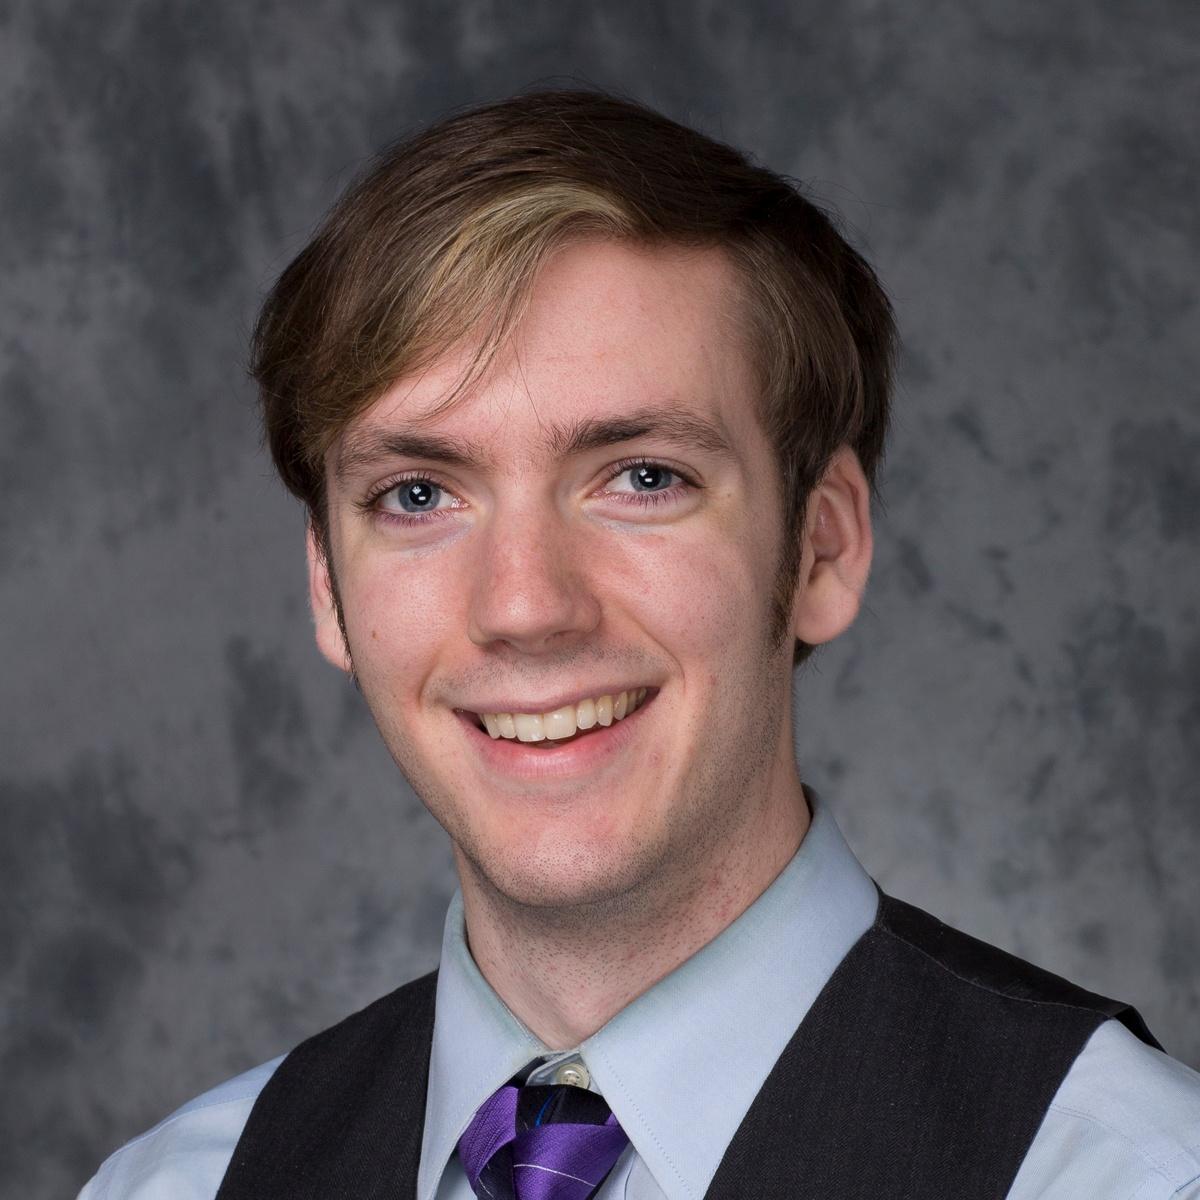 Lucas Zellers Speaker